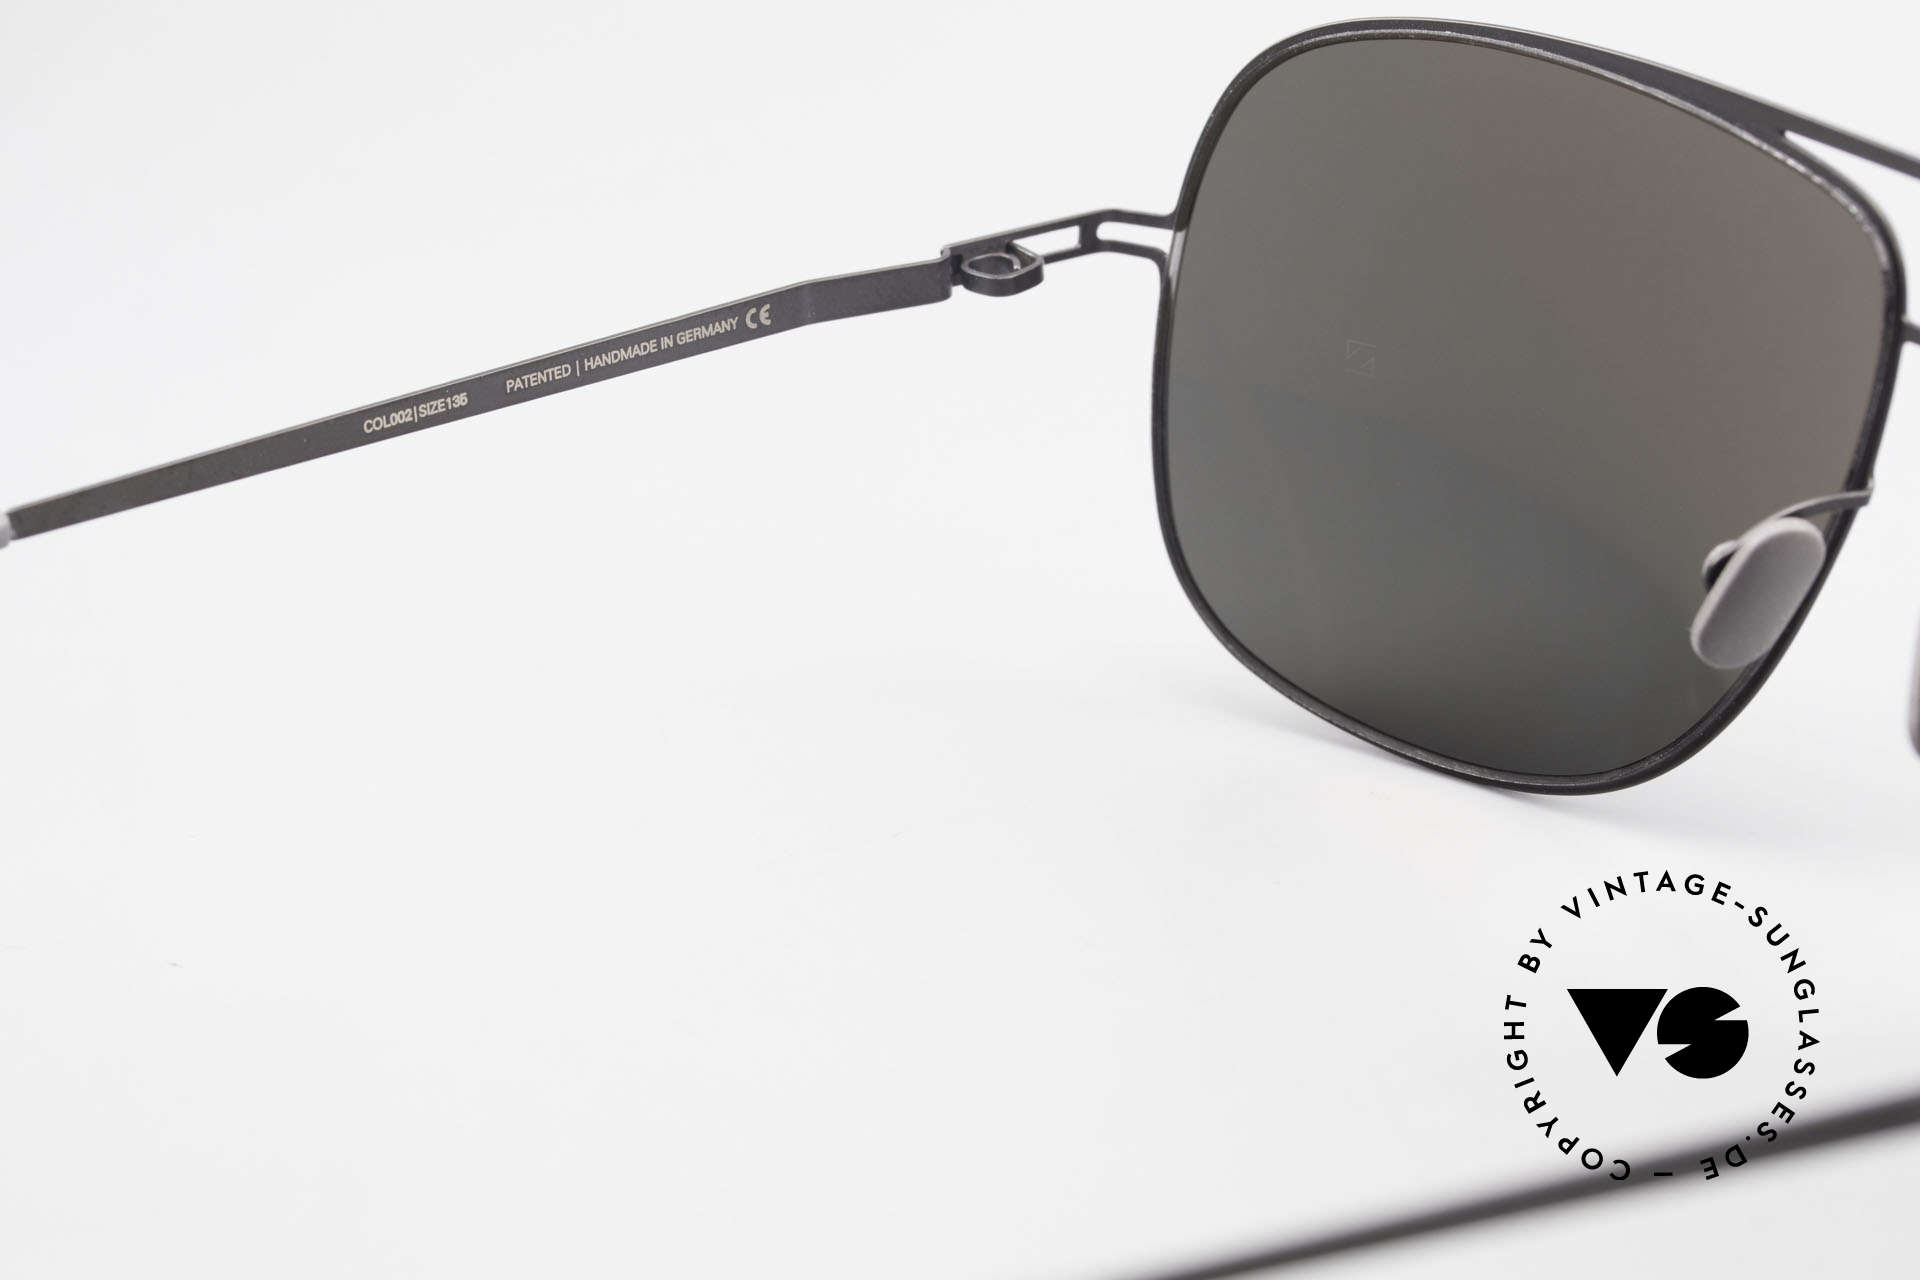 Mykita Jon Lite Metal Designer Sunglasses, unworn model comes with an original case by MYKITA, Made for Men and Women